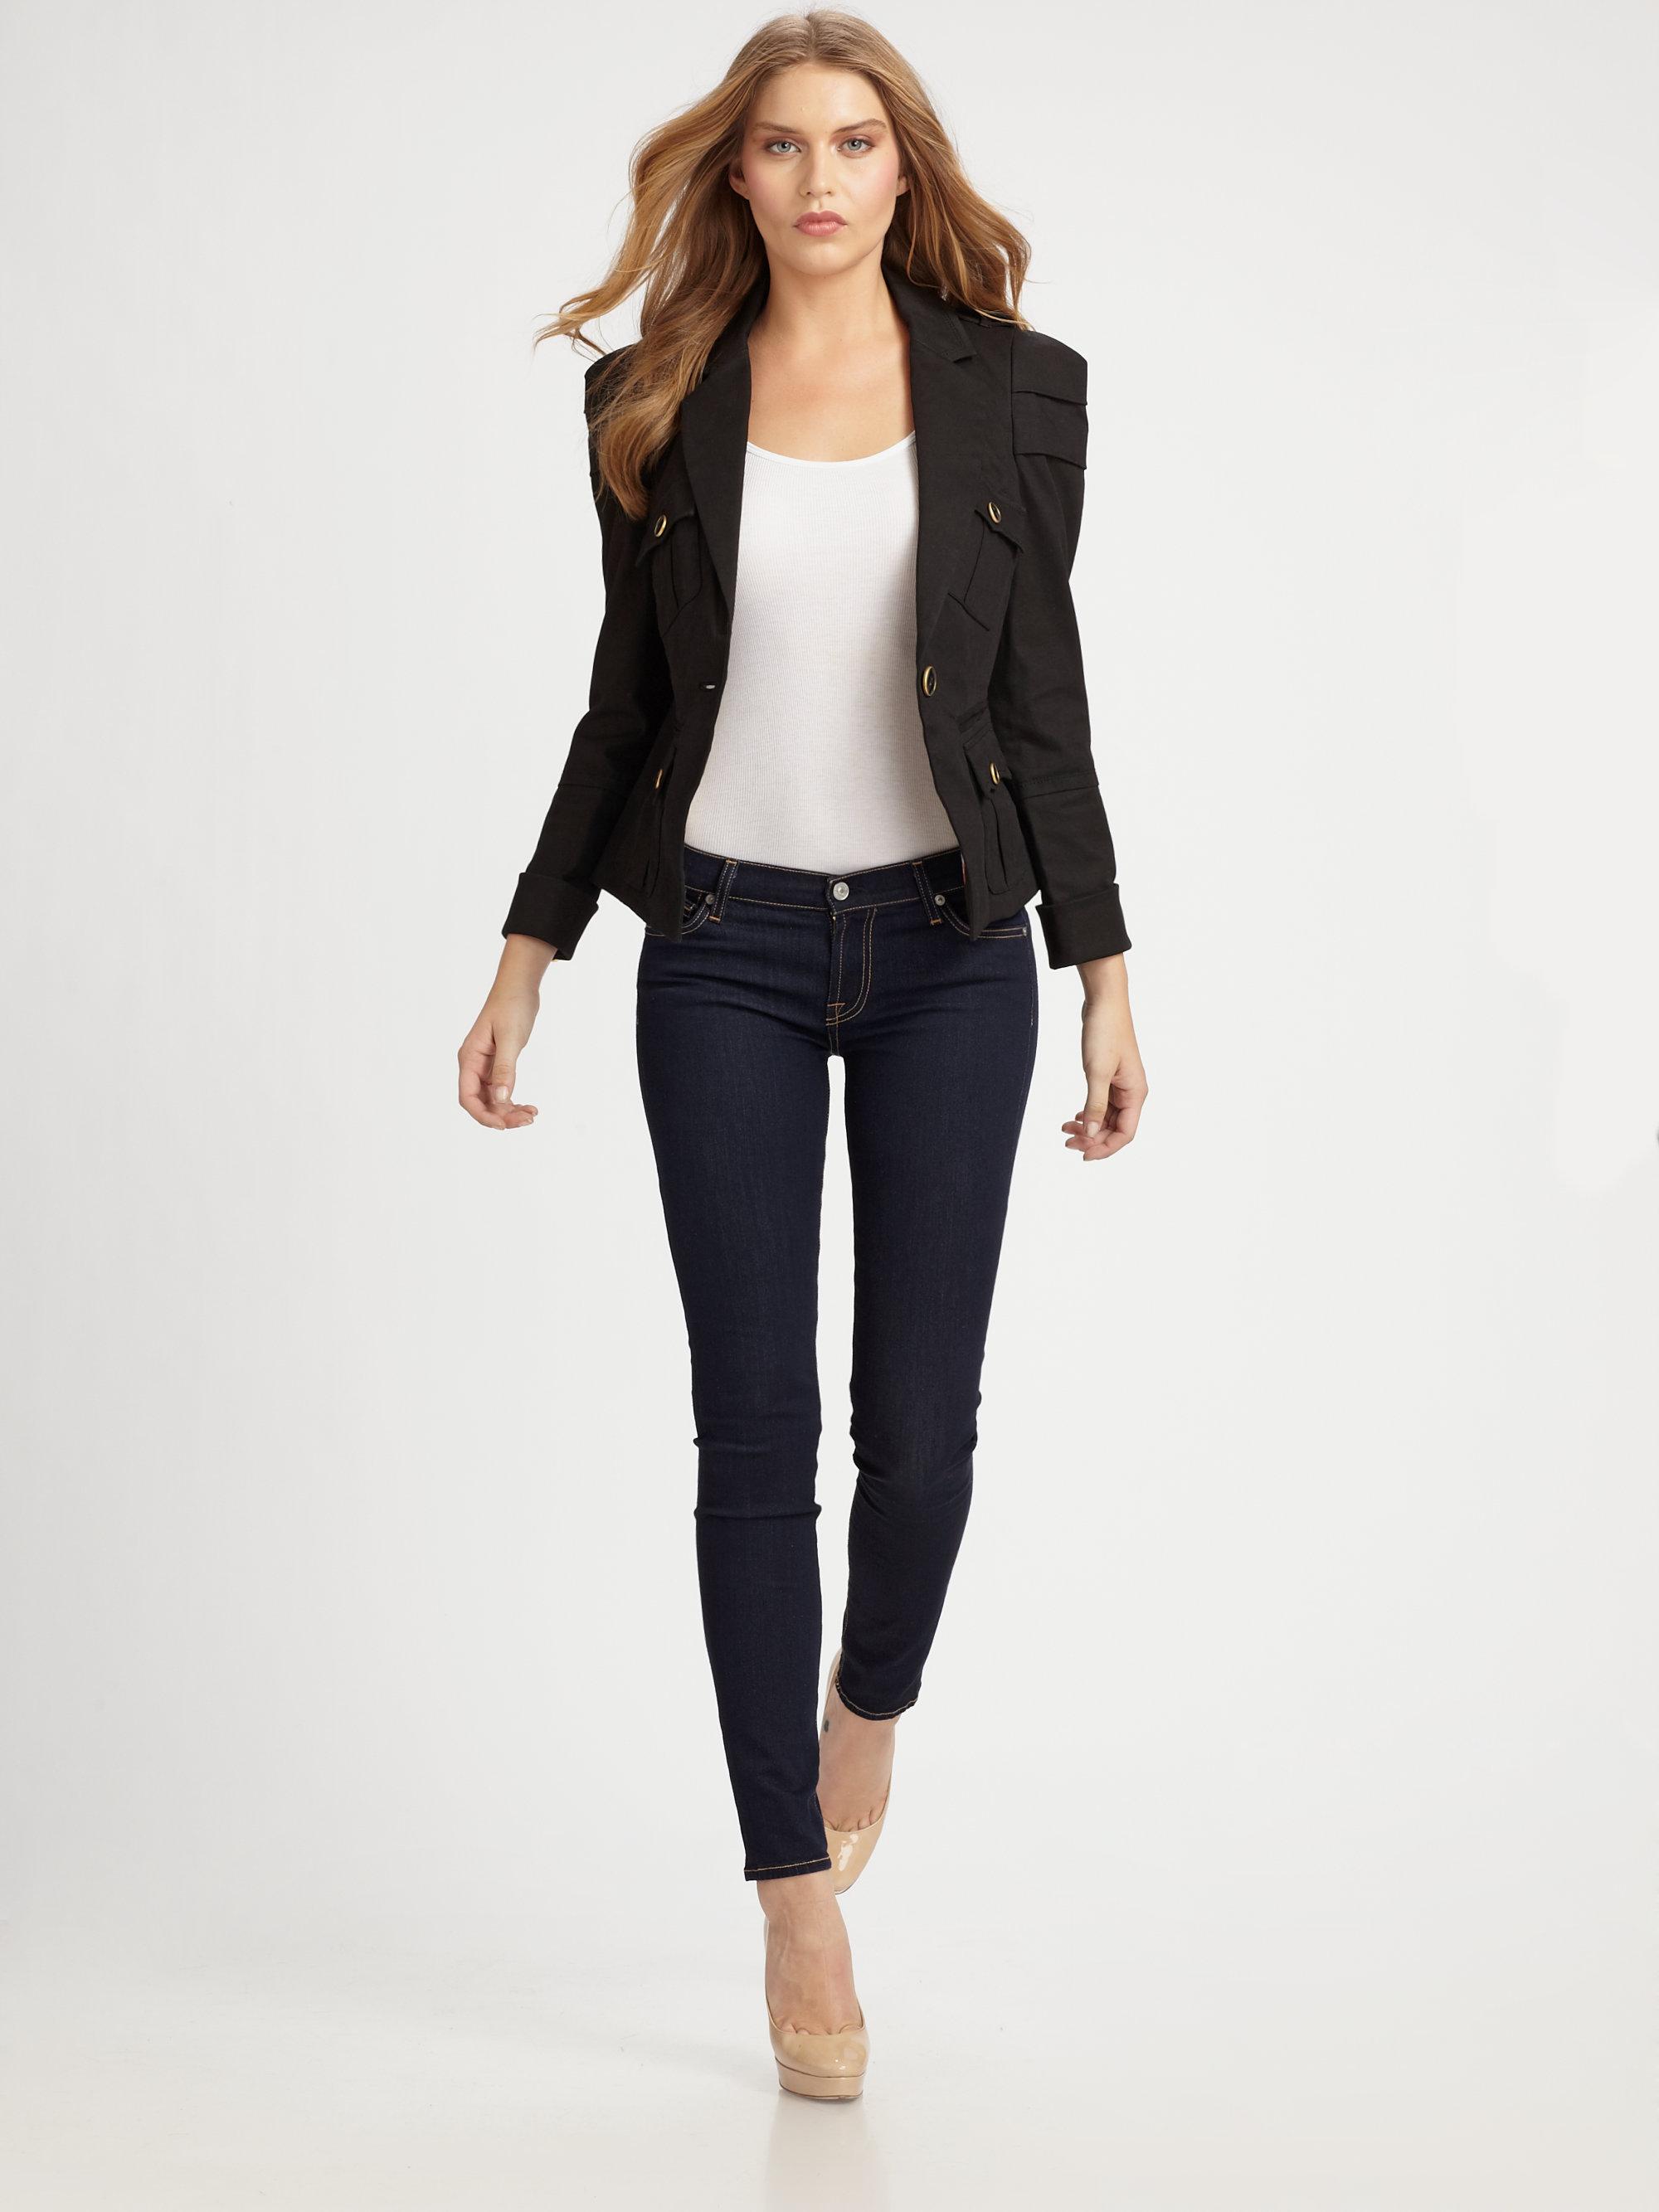 business casual dress code women photo - 1